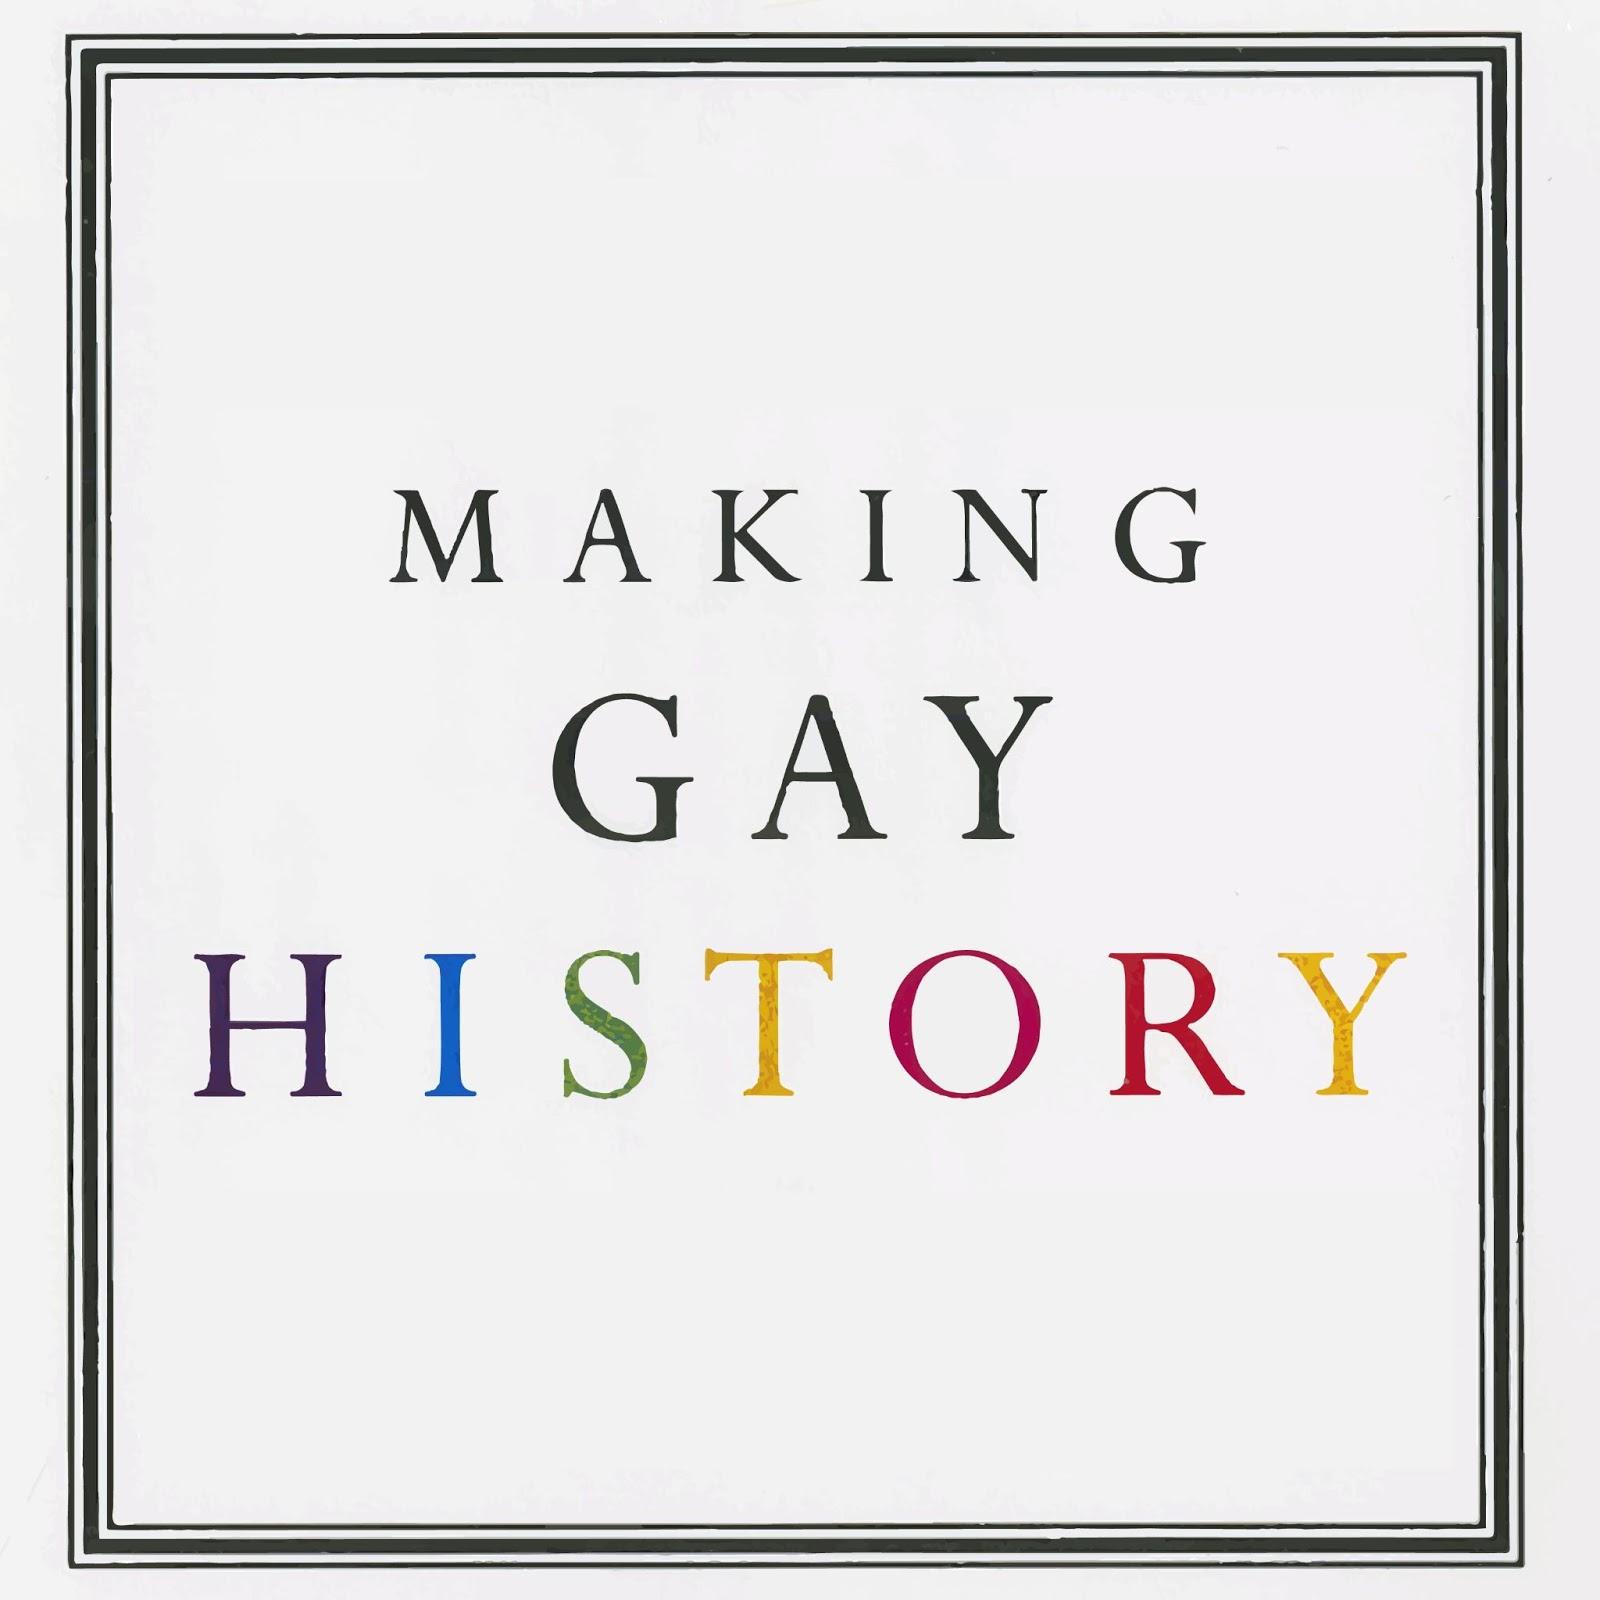 Making Gay History podcast